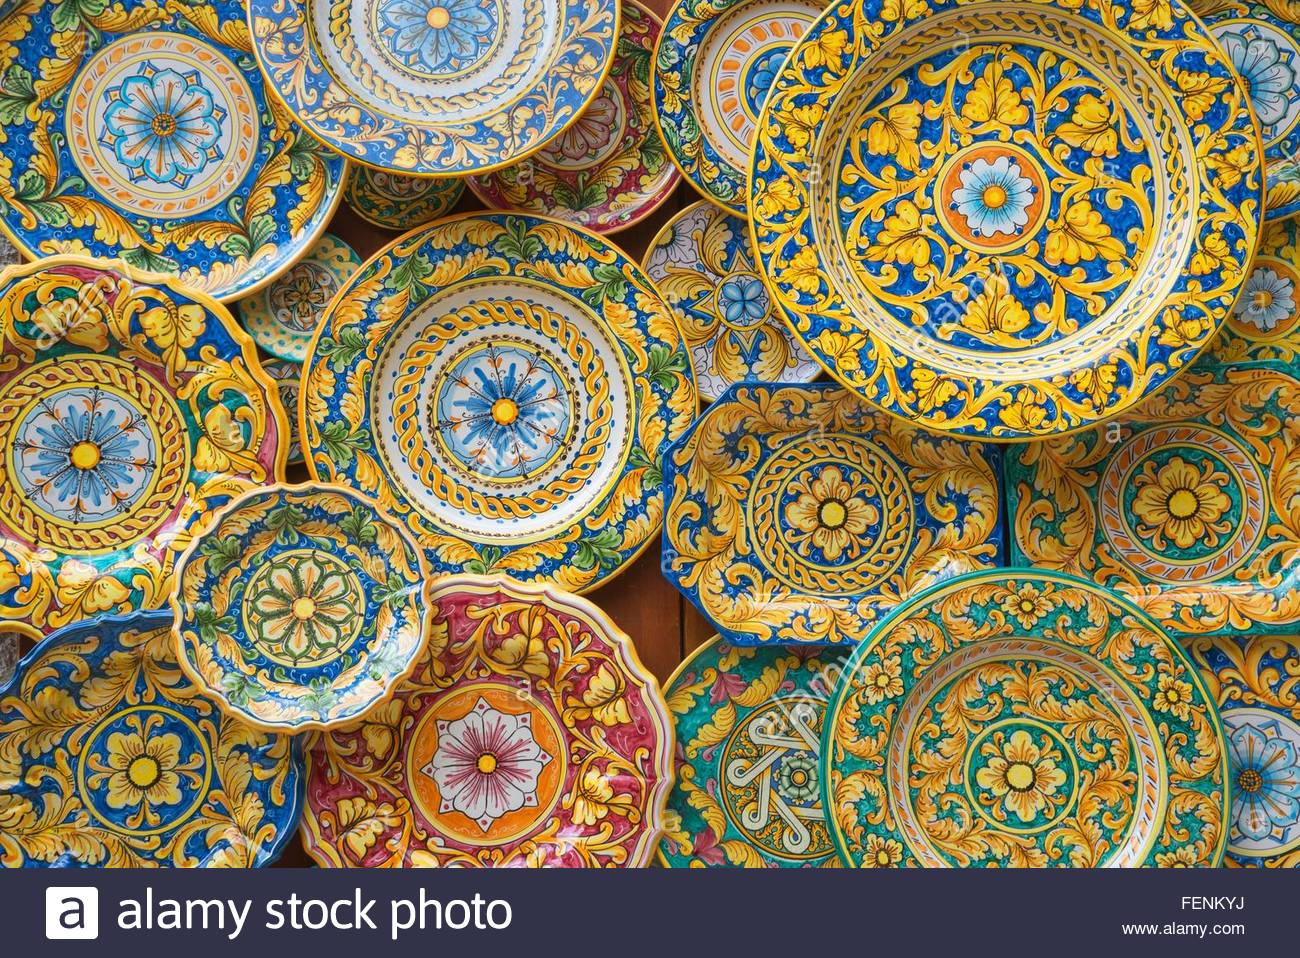 Traditionellen handbemalten verzierte Platten, Sizilien, Italien Stockbild